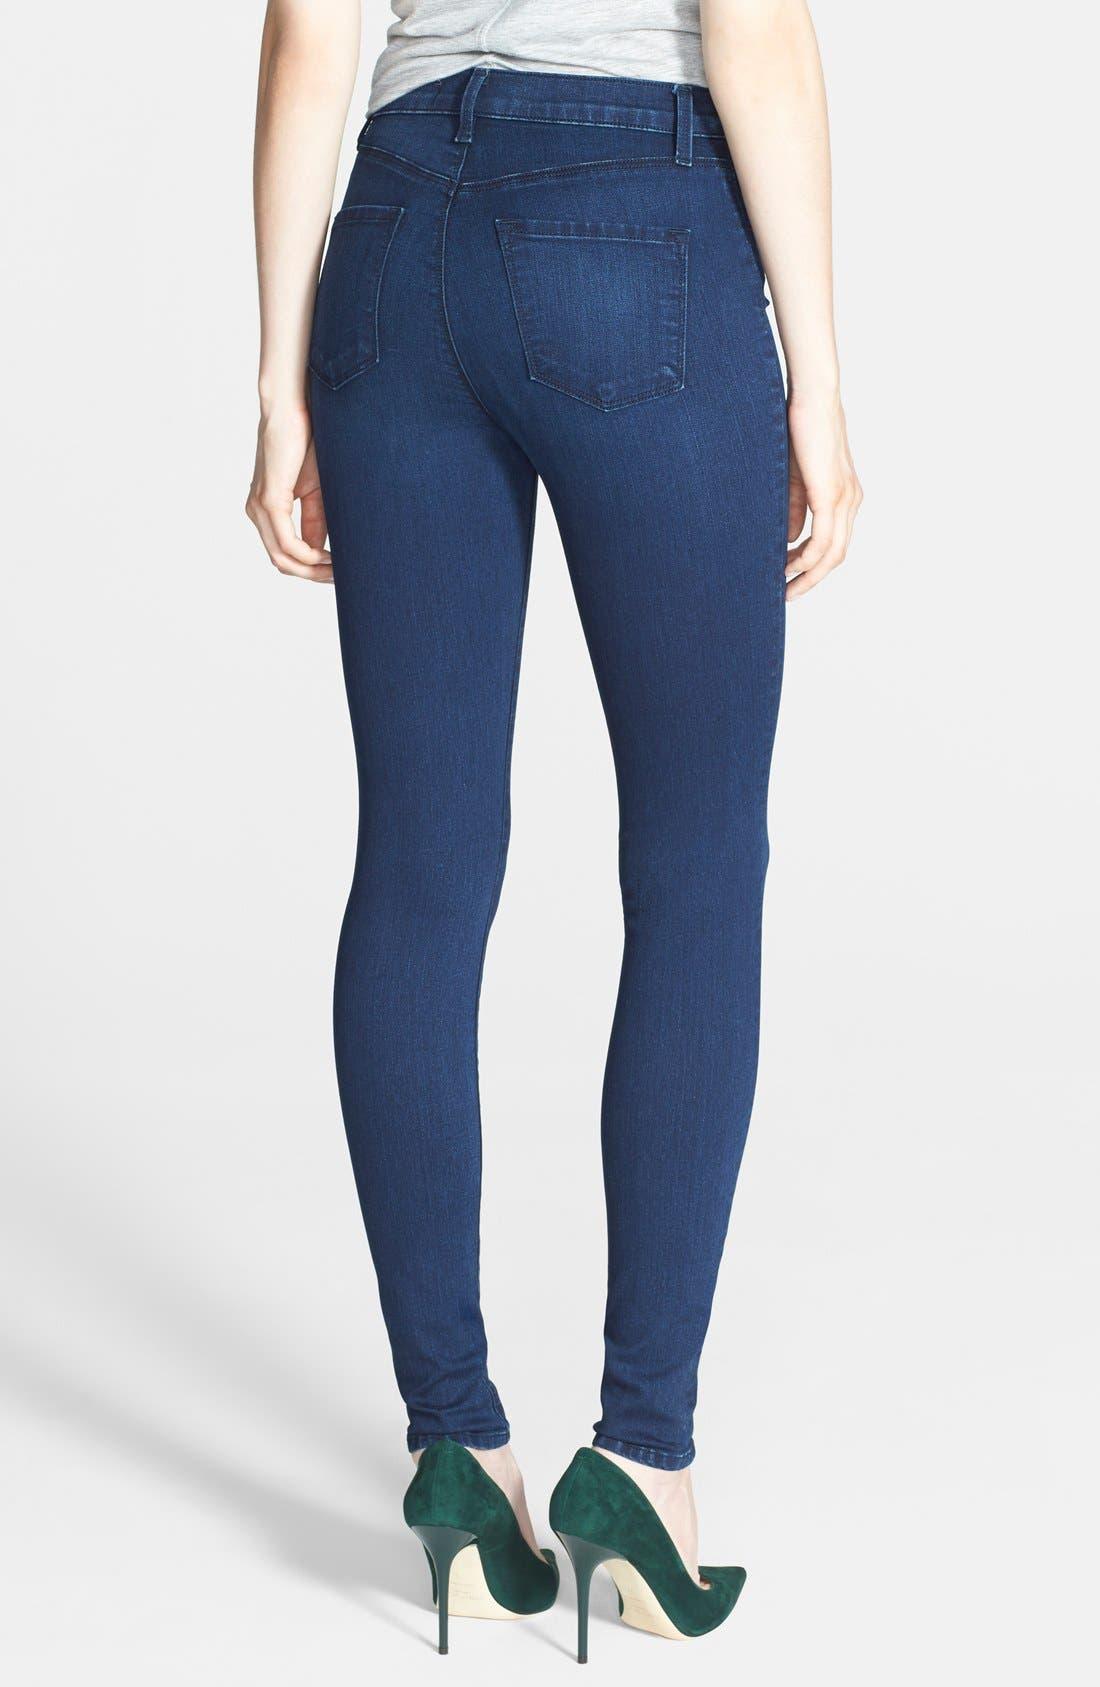 Alternate Image 2  - J Brand 'Maria' High Rise Skinny Jeans (Maria Destiny)